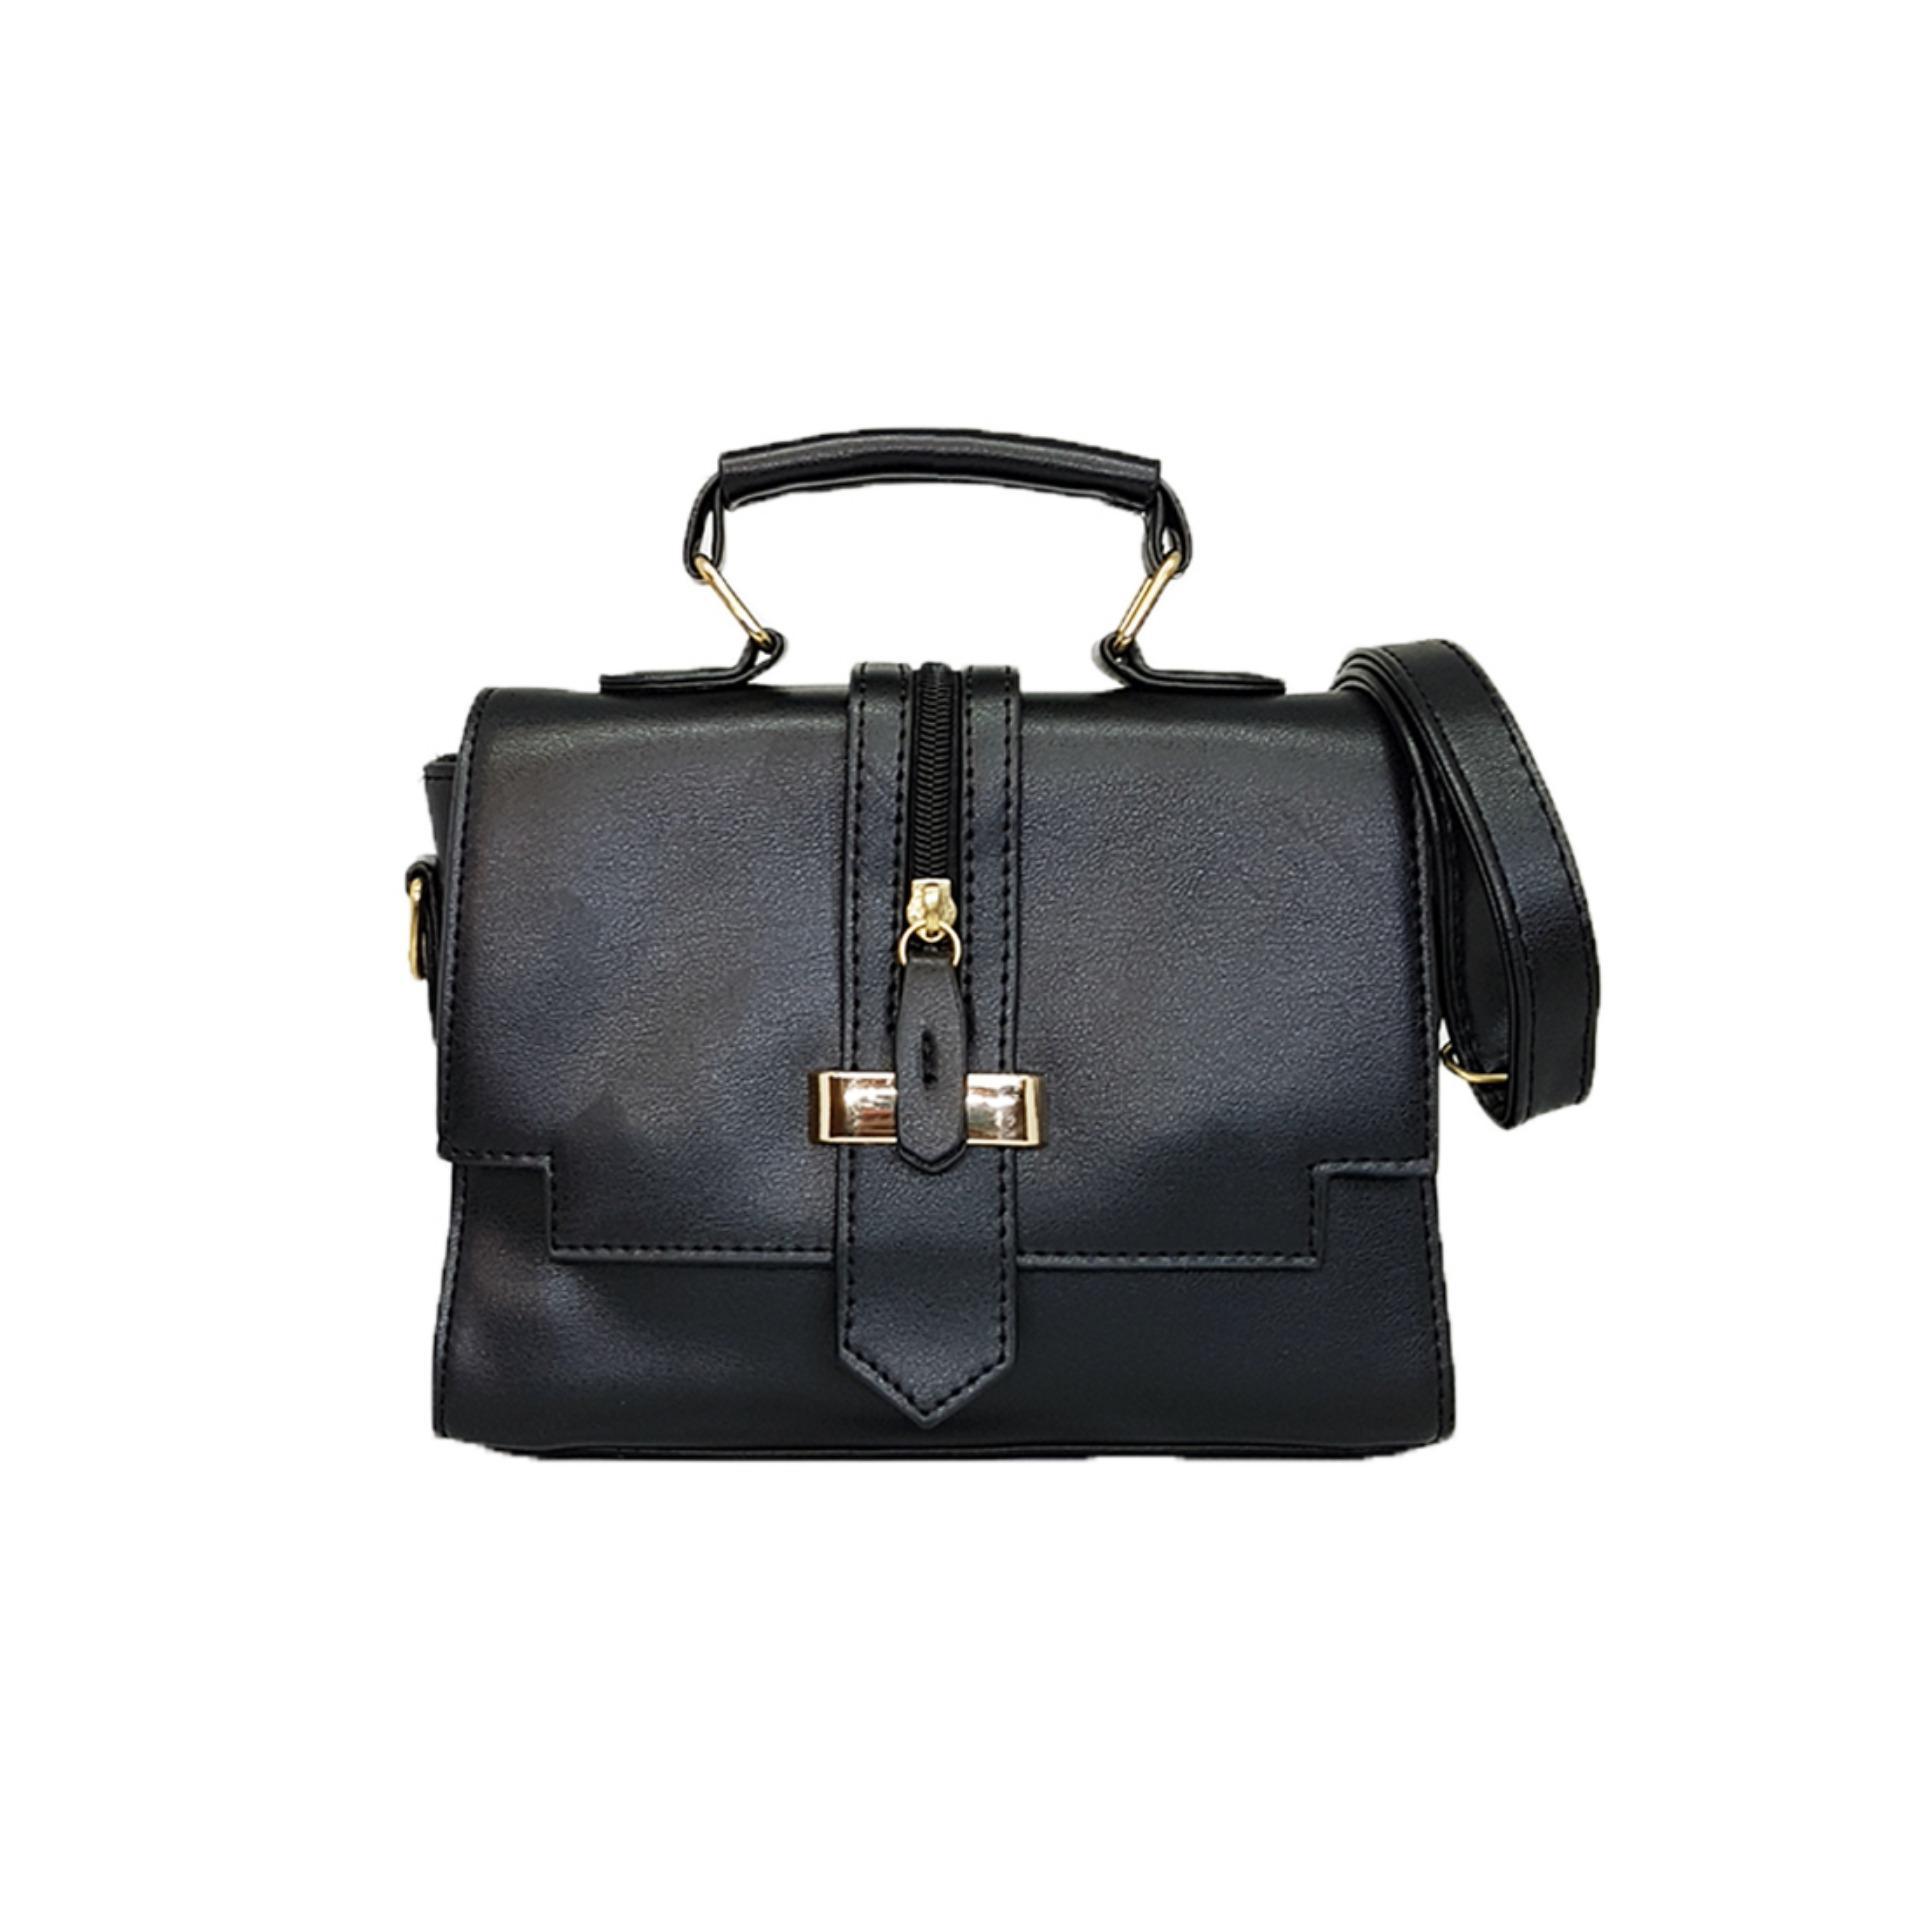 Buy Sell Cheapest Catriona Diamond Bag Best Quality Product Deals Premium Alva Shoulder Brown Yadira Top Handle Black